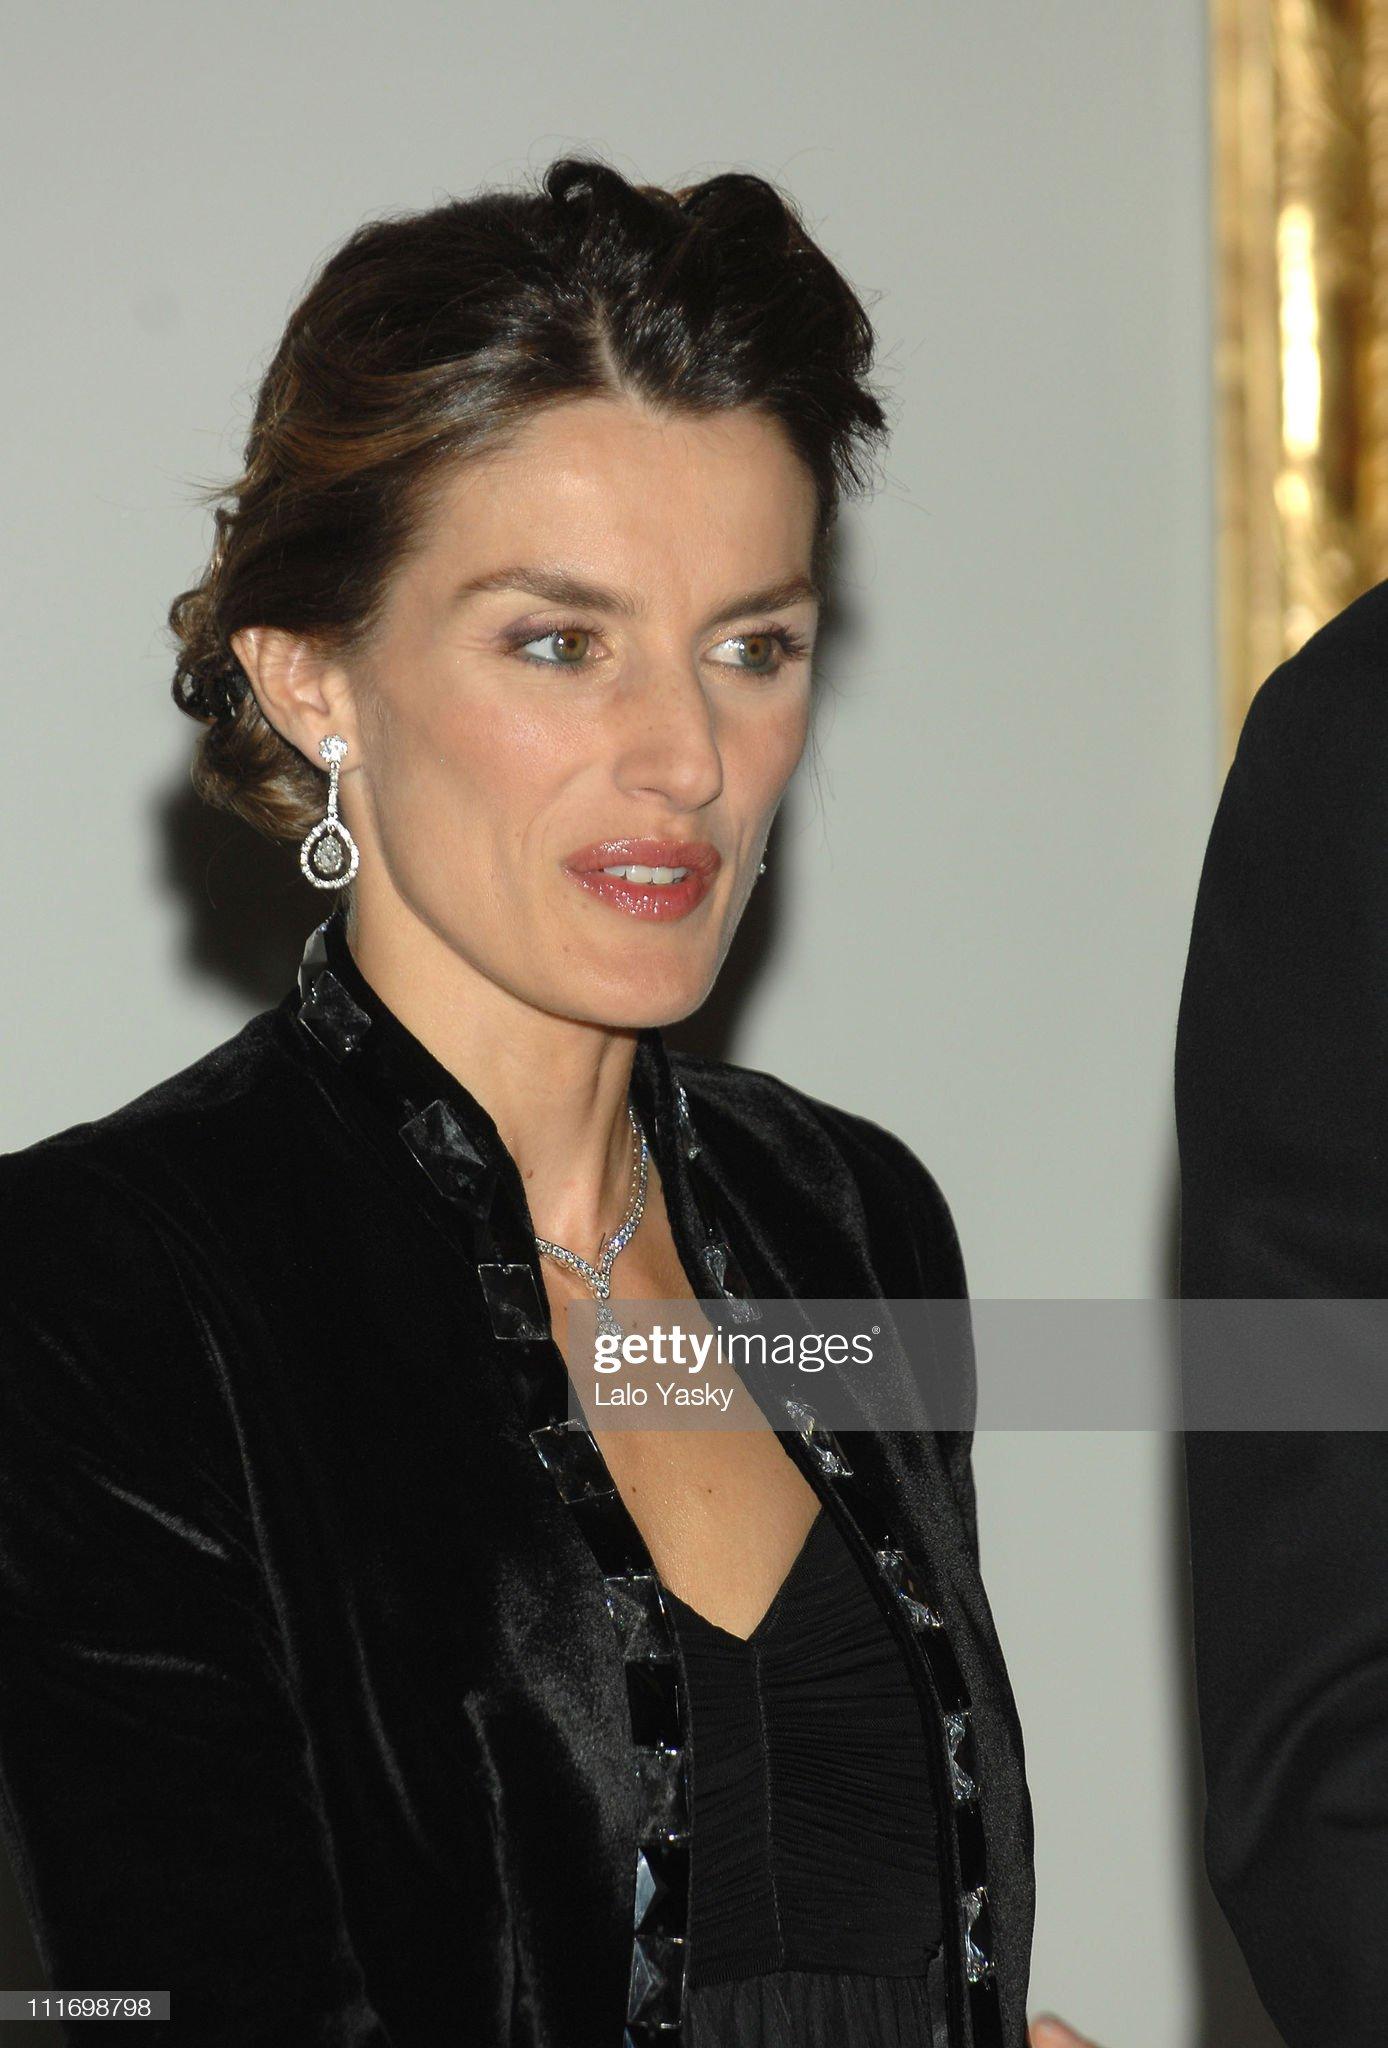 Вечерние наряды Королевы Летиции Spanish Royals Attend Opening Gala Dinner of Extension at El Prado Museum : News Photo